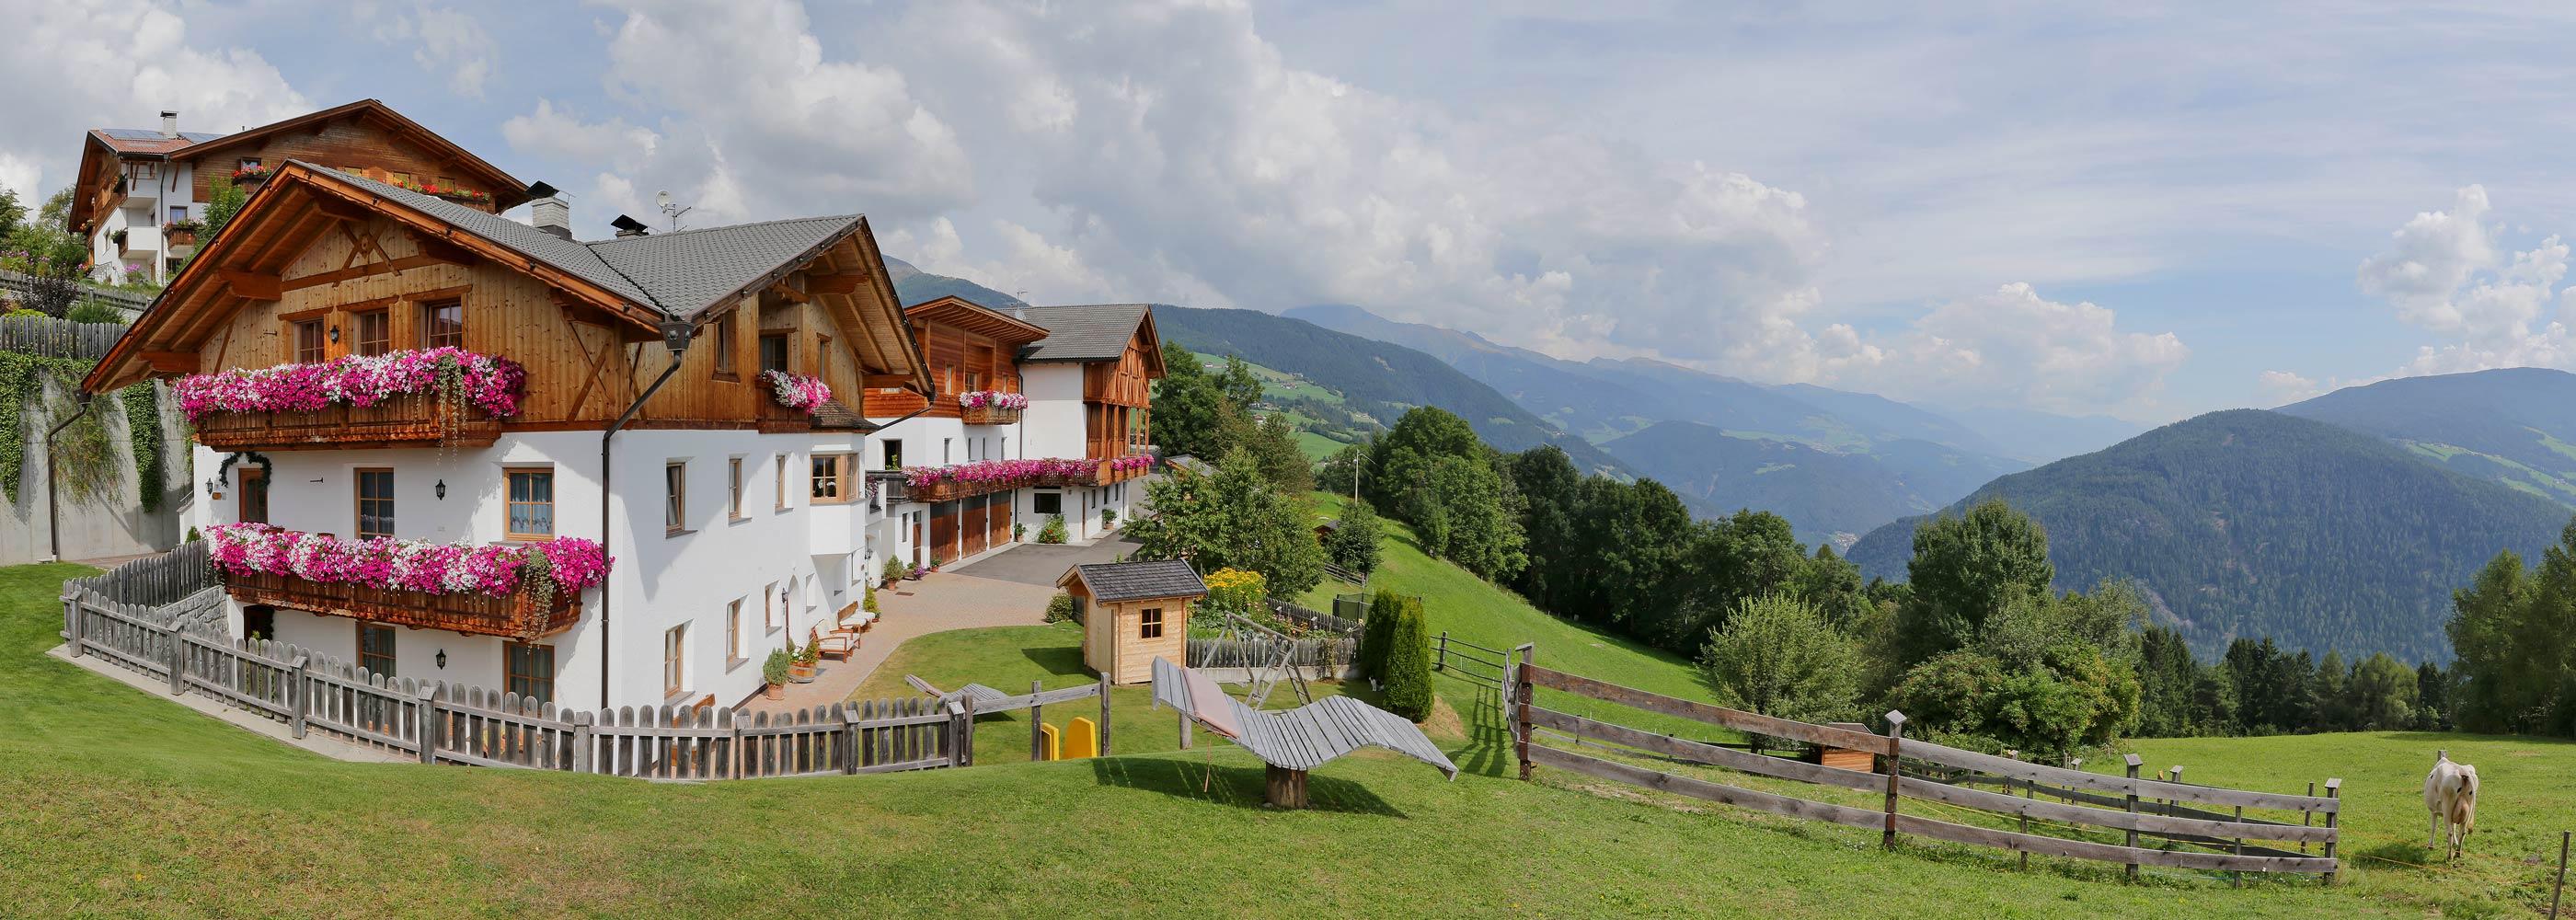 urlaub-birkenhof-meransen-vacanze-maso-maranza-holidays-farm-south-tyrol